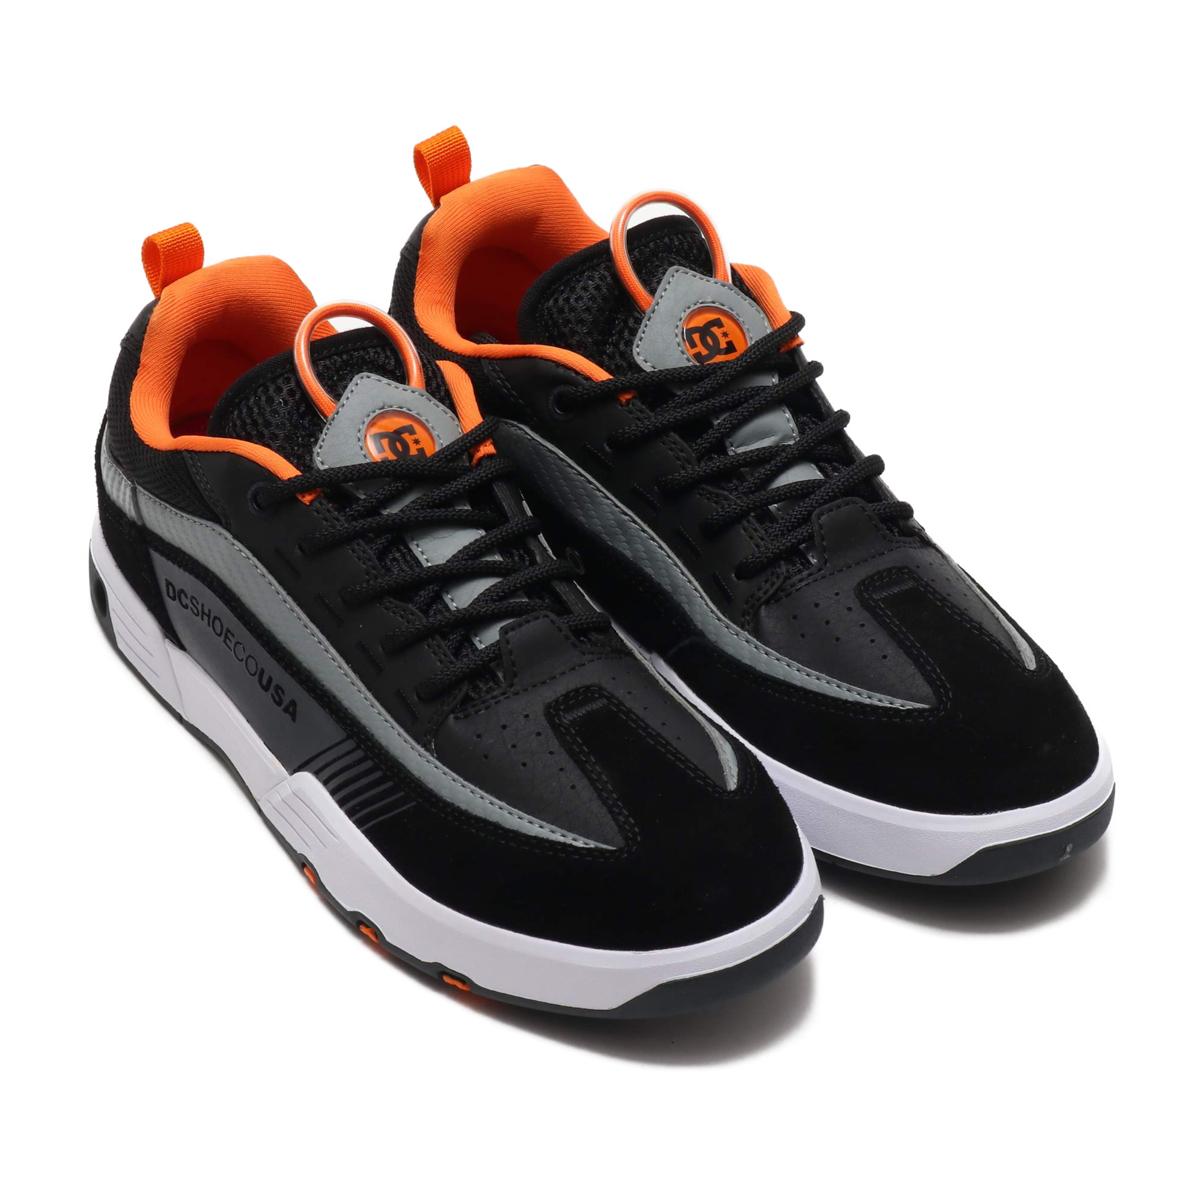 ef4714818a07fb Kinetics: DC SHOES LEGACY 98 SLIM S (BLACK/ORANGE/GREY) (D sea shoes ...